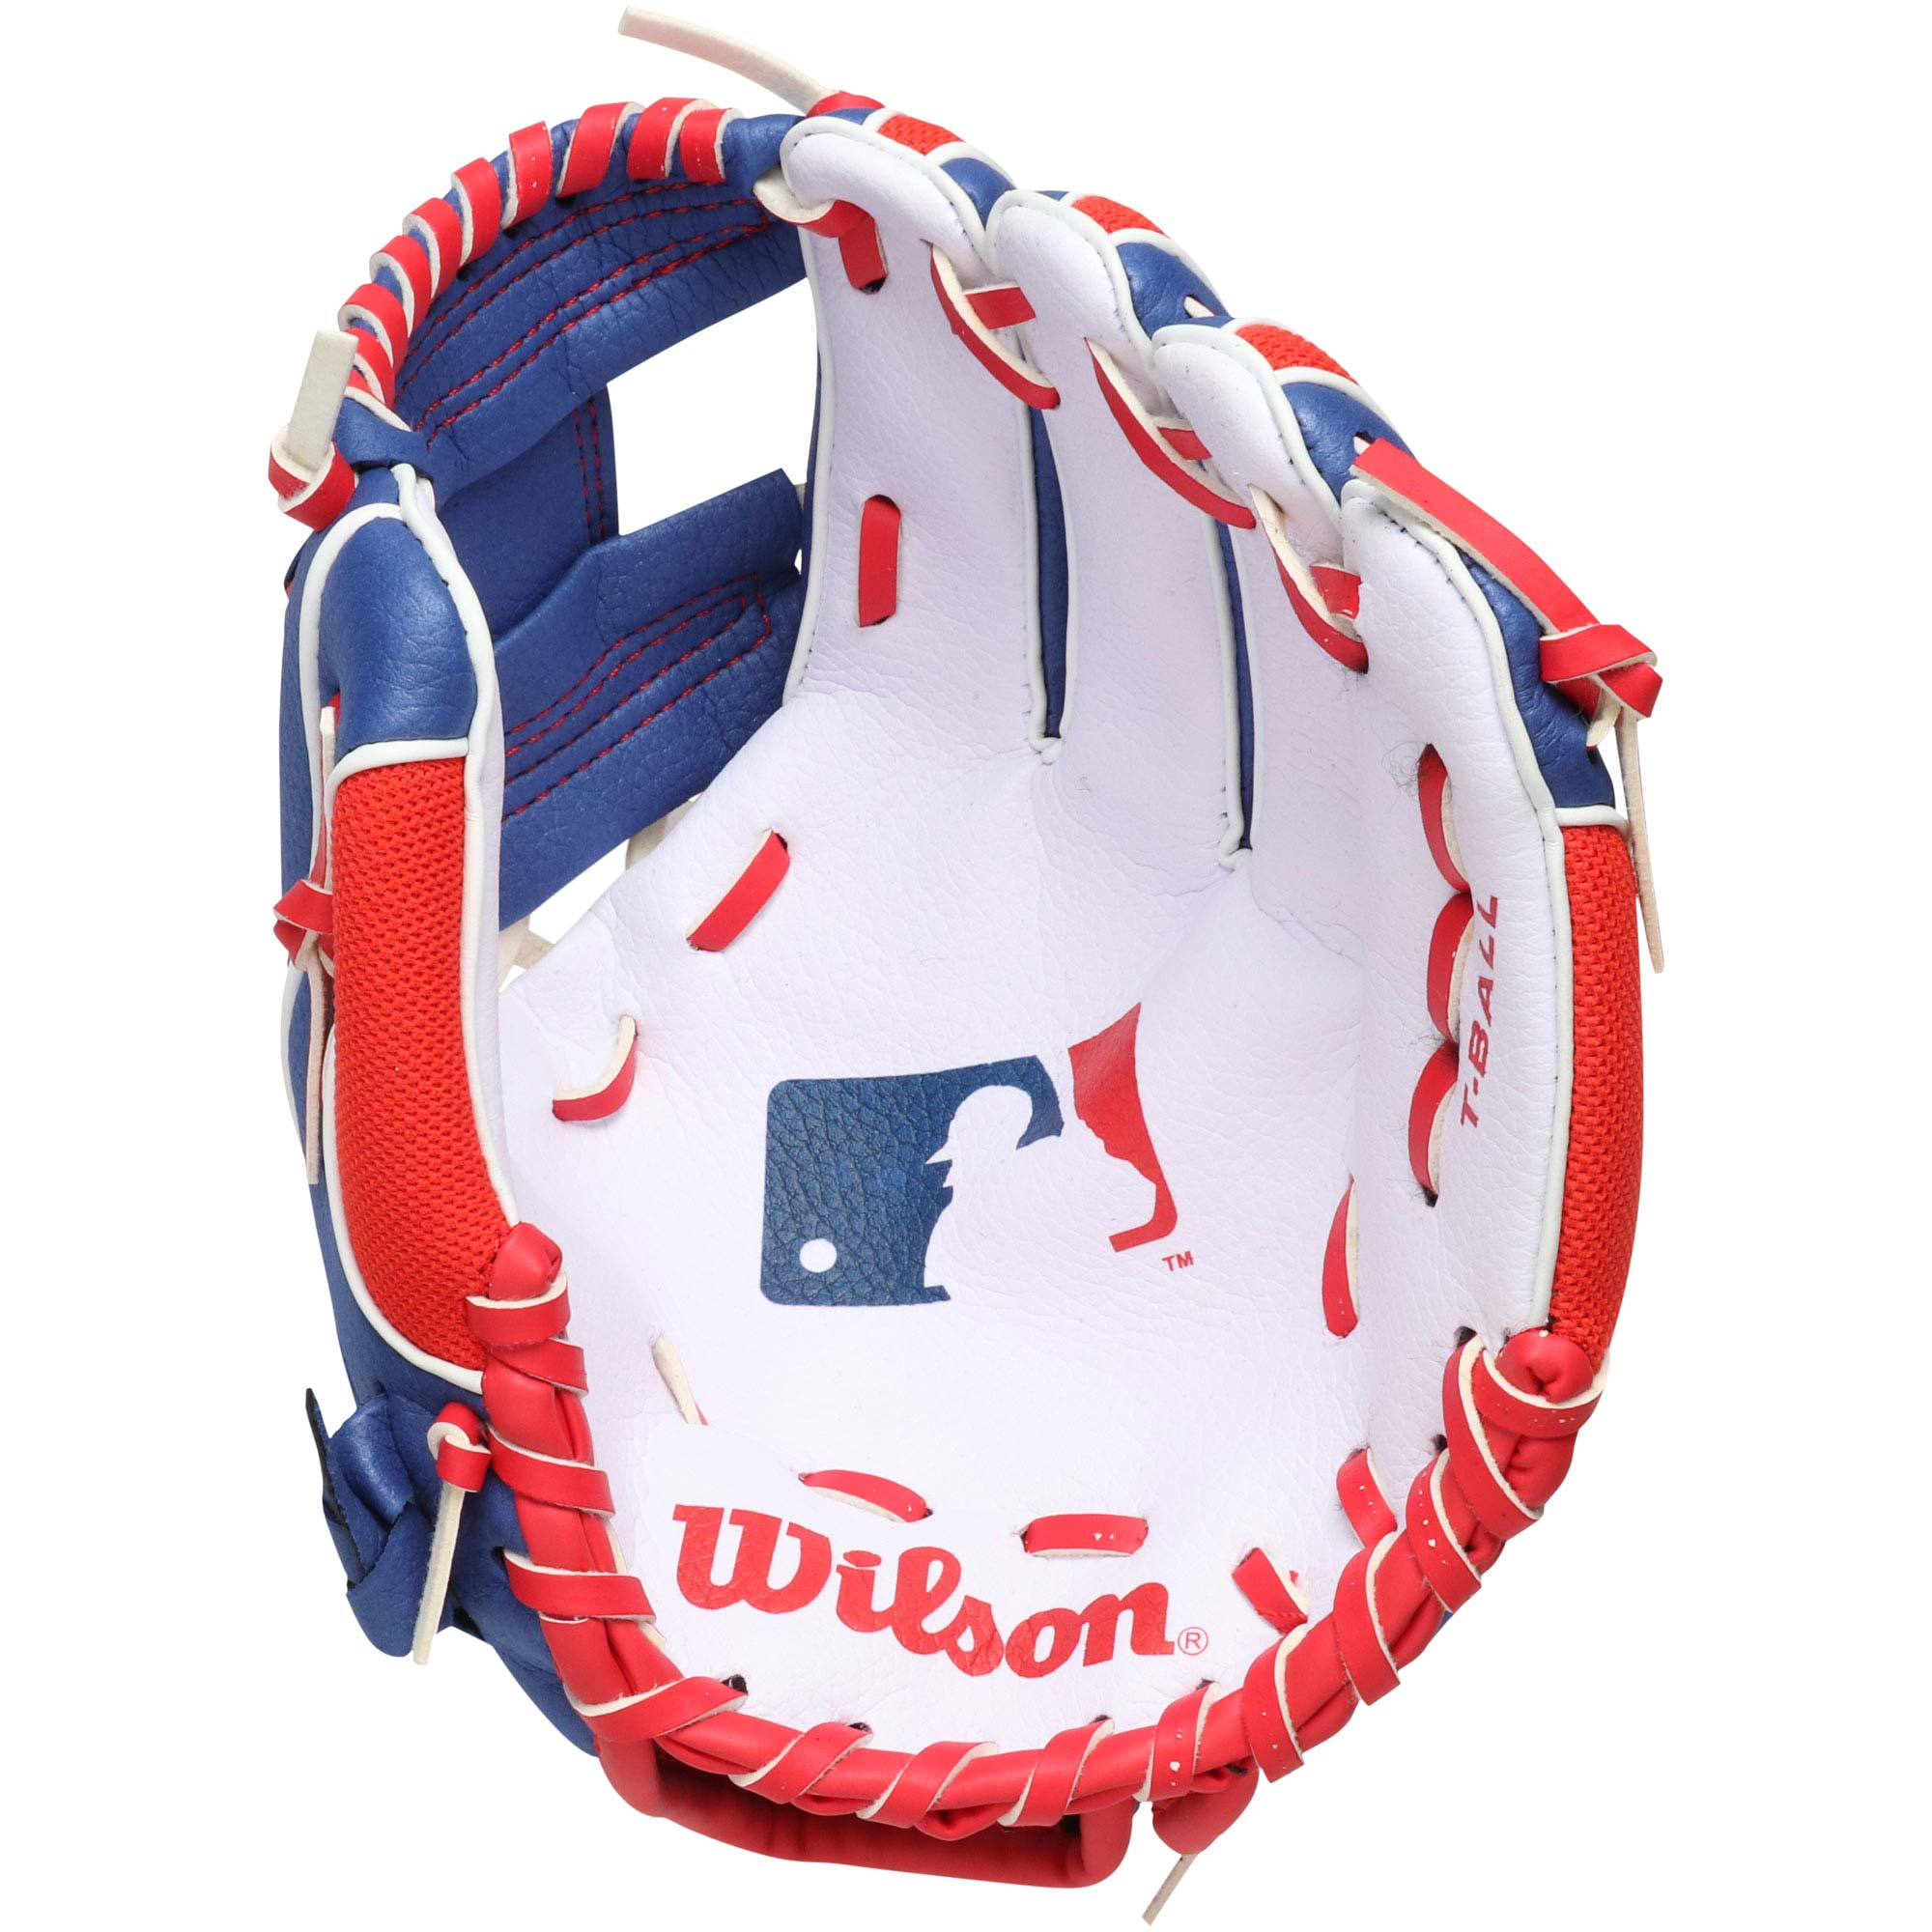 MLB Merchandise Wilson Youth Baseball Tee Ball Glove - No Size